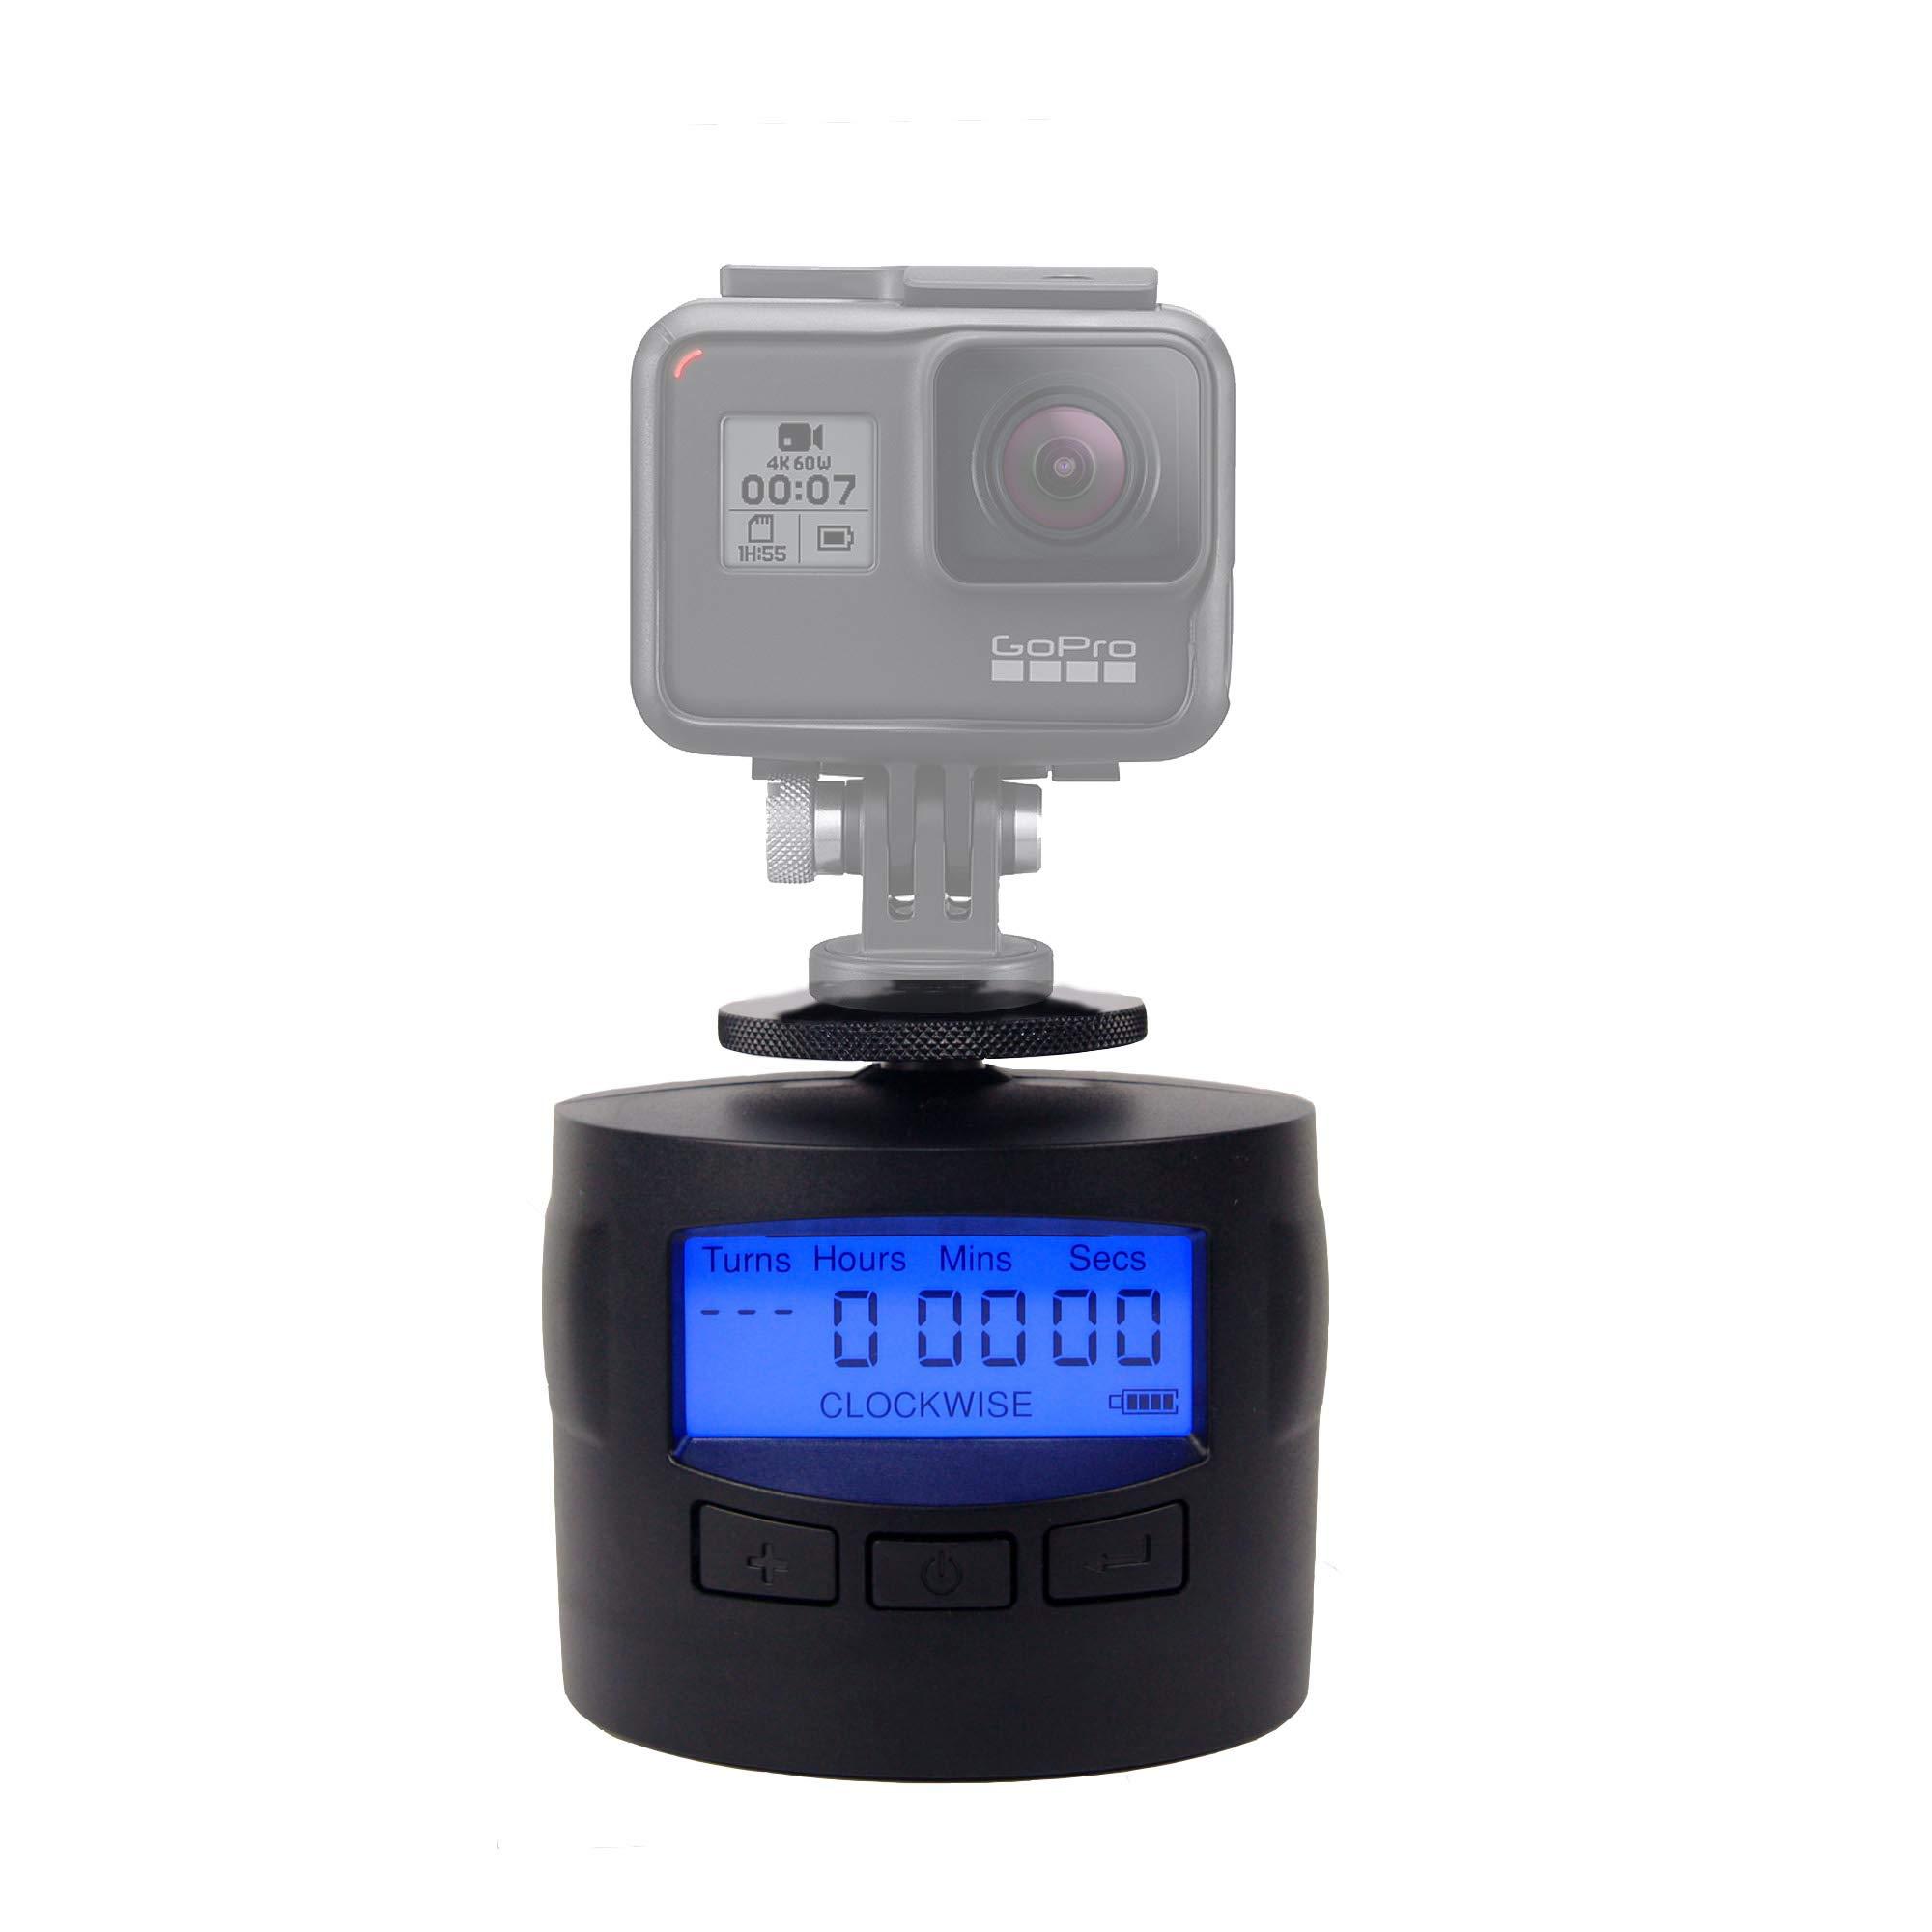 TurnsPro - Time Lapse Camera Mount - Panning Rotating 360 for GoPro DSLR iPhone. Motorised Pan Head for Panoramic Photos